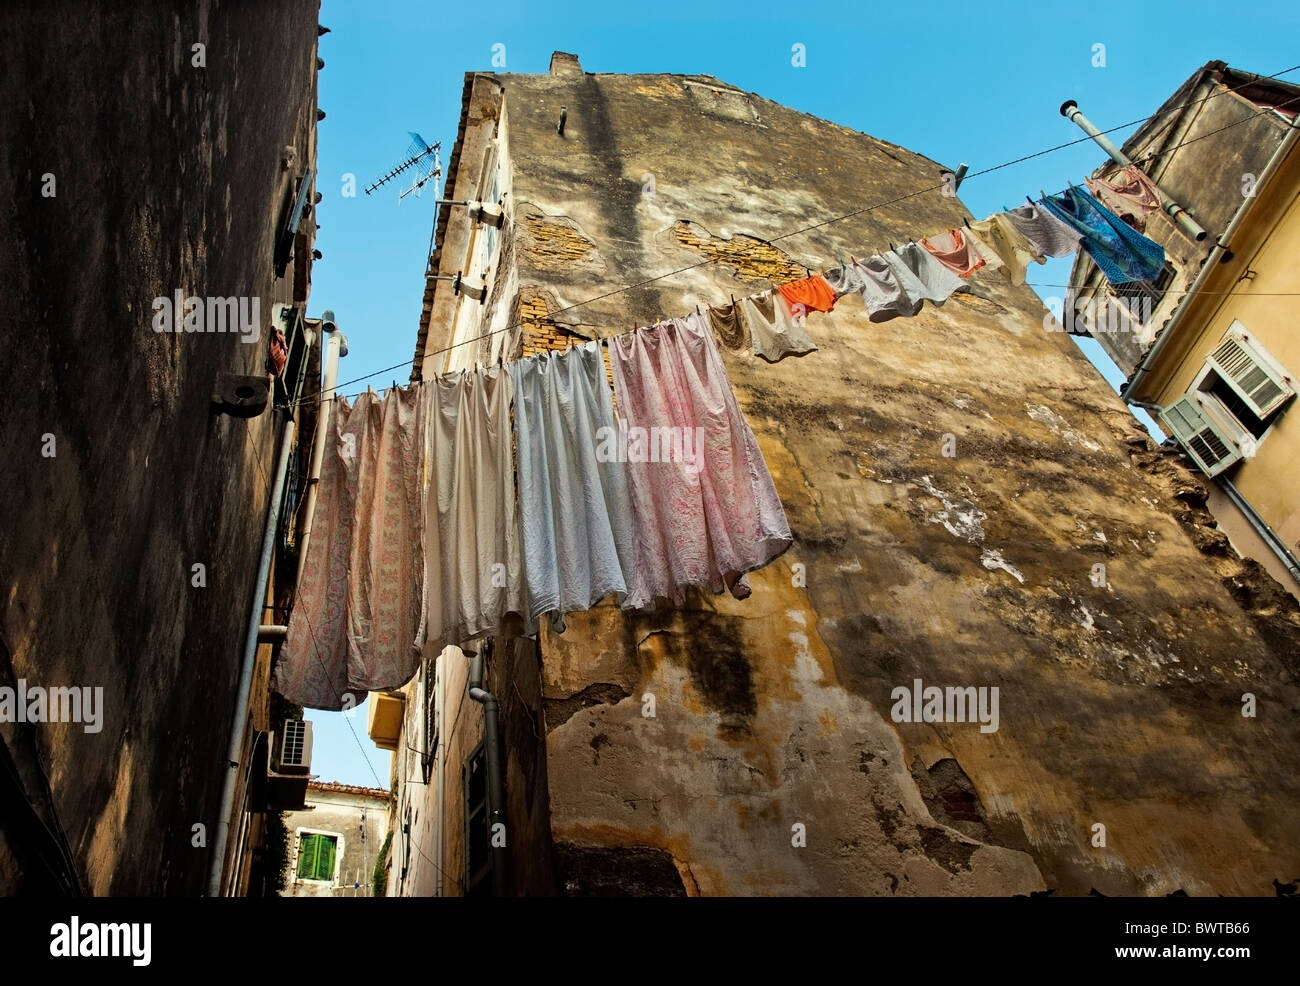 Back Street in Corfu Town, Ionian Islands Greece. - Stock Image